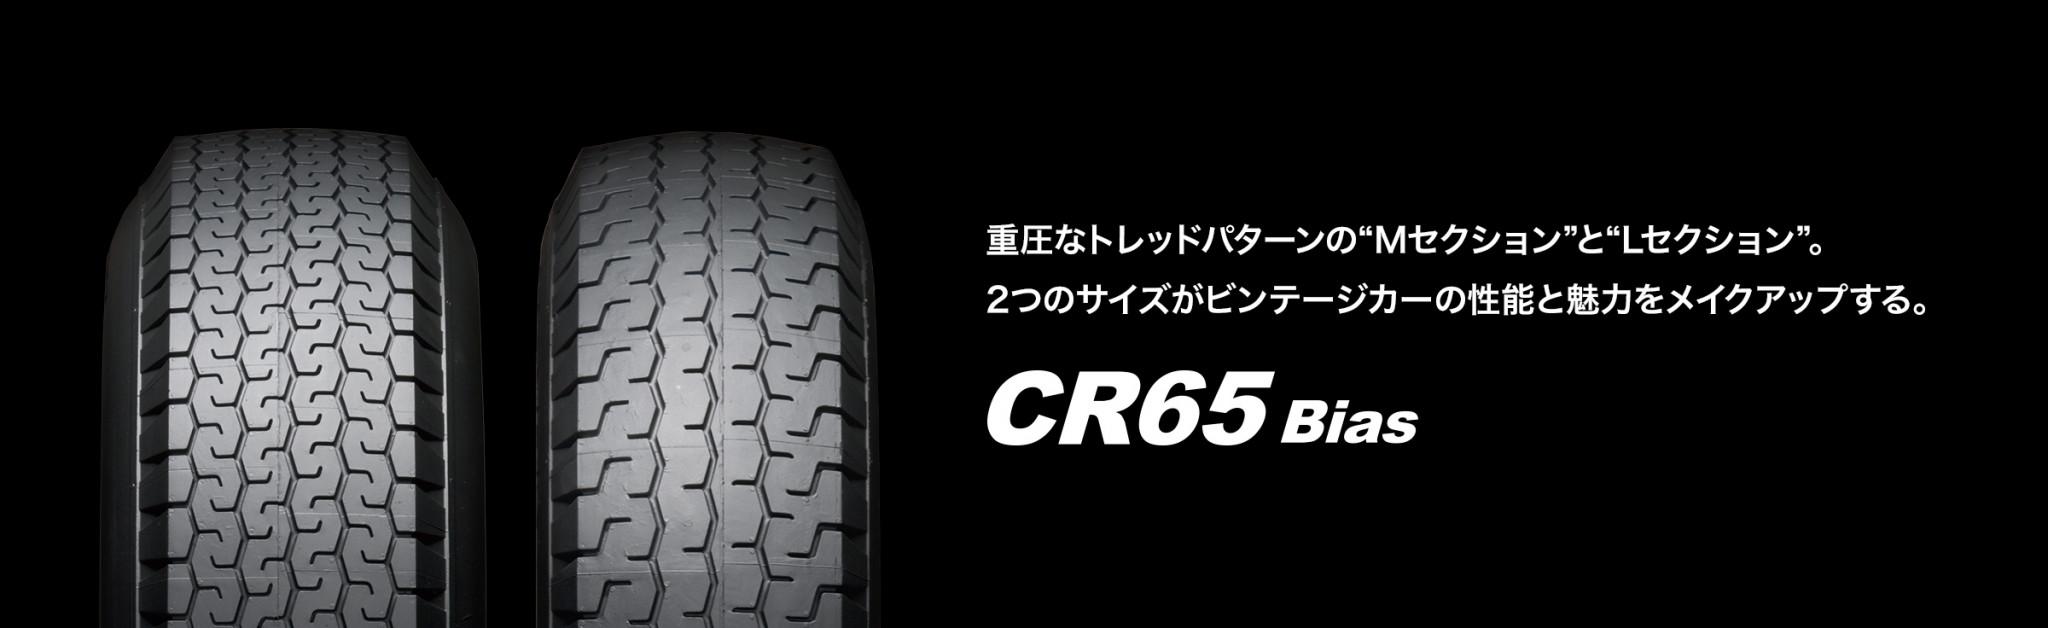 CR65 Bias